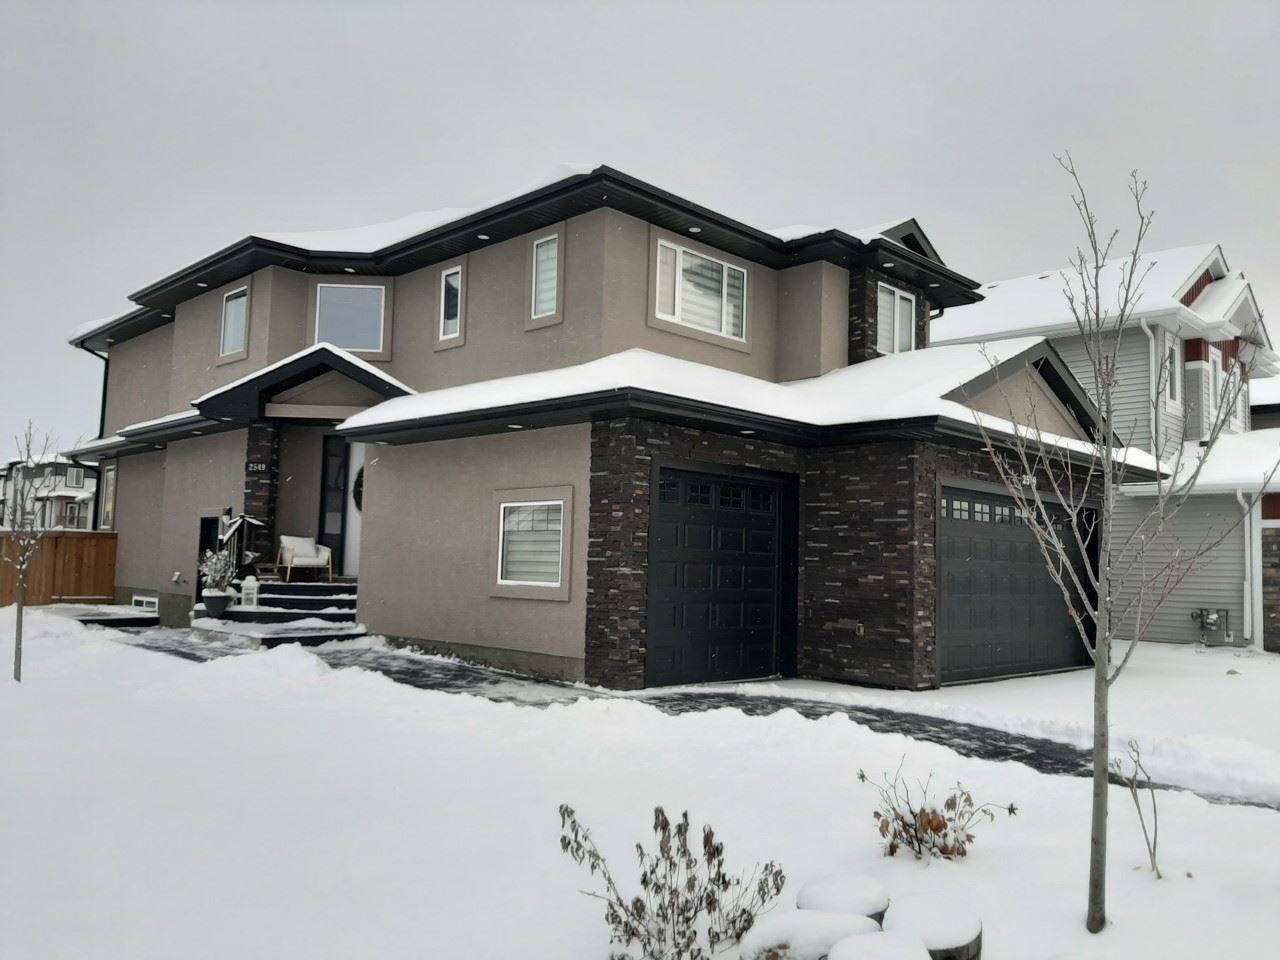 Main Photo: 2549 AMERONGEN Crescent in Edmonton: Zone 55 House for sale : MLS®# E4179553